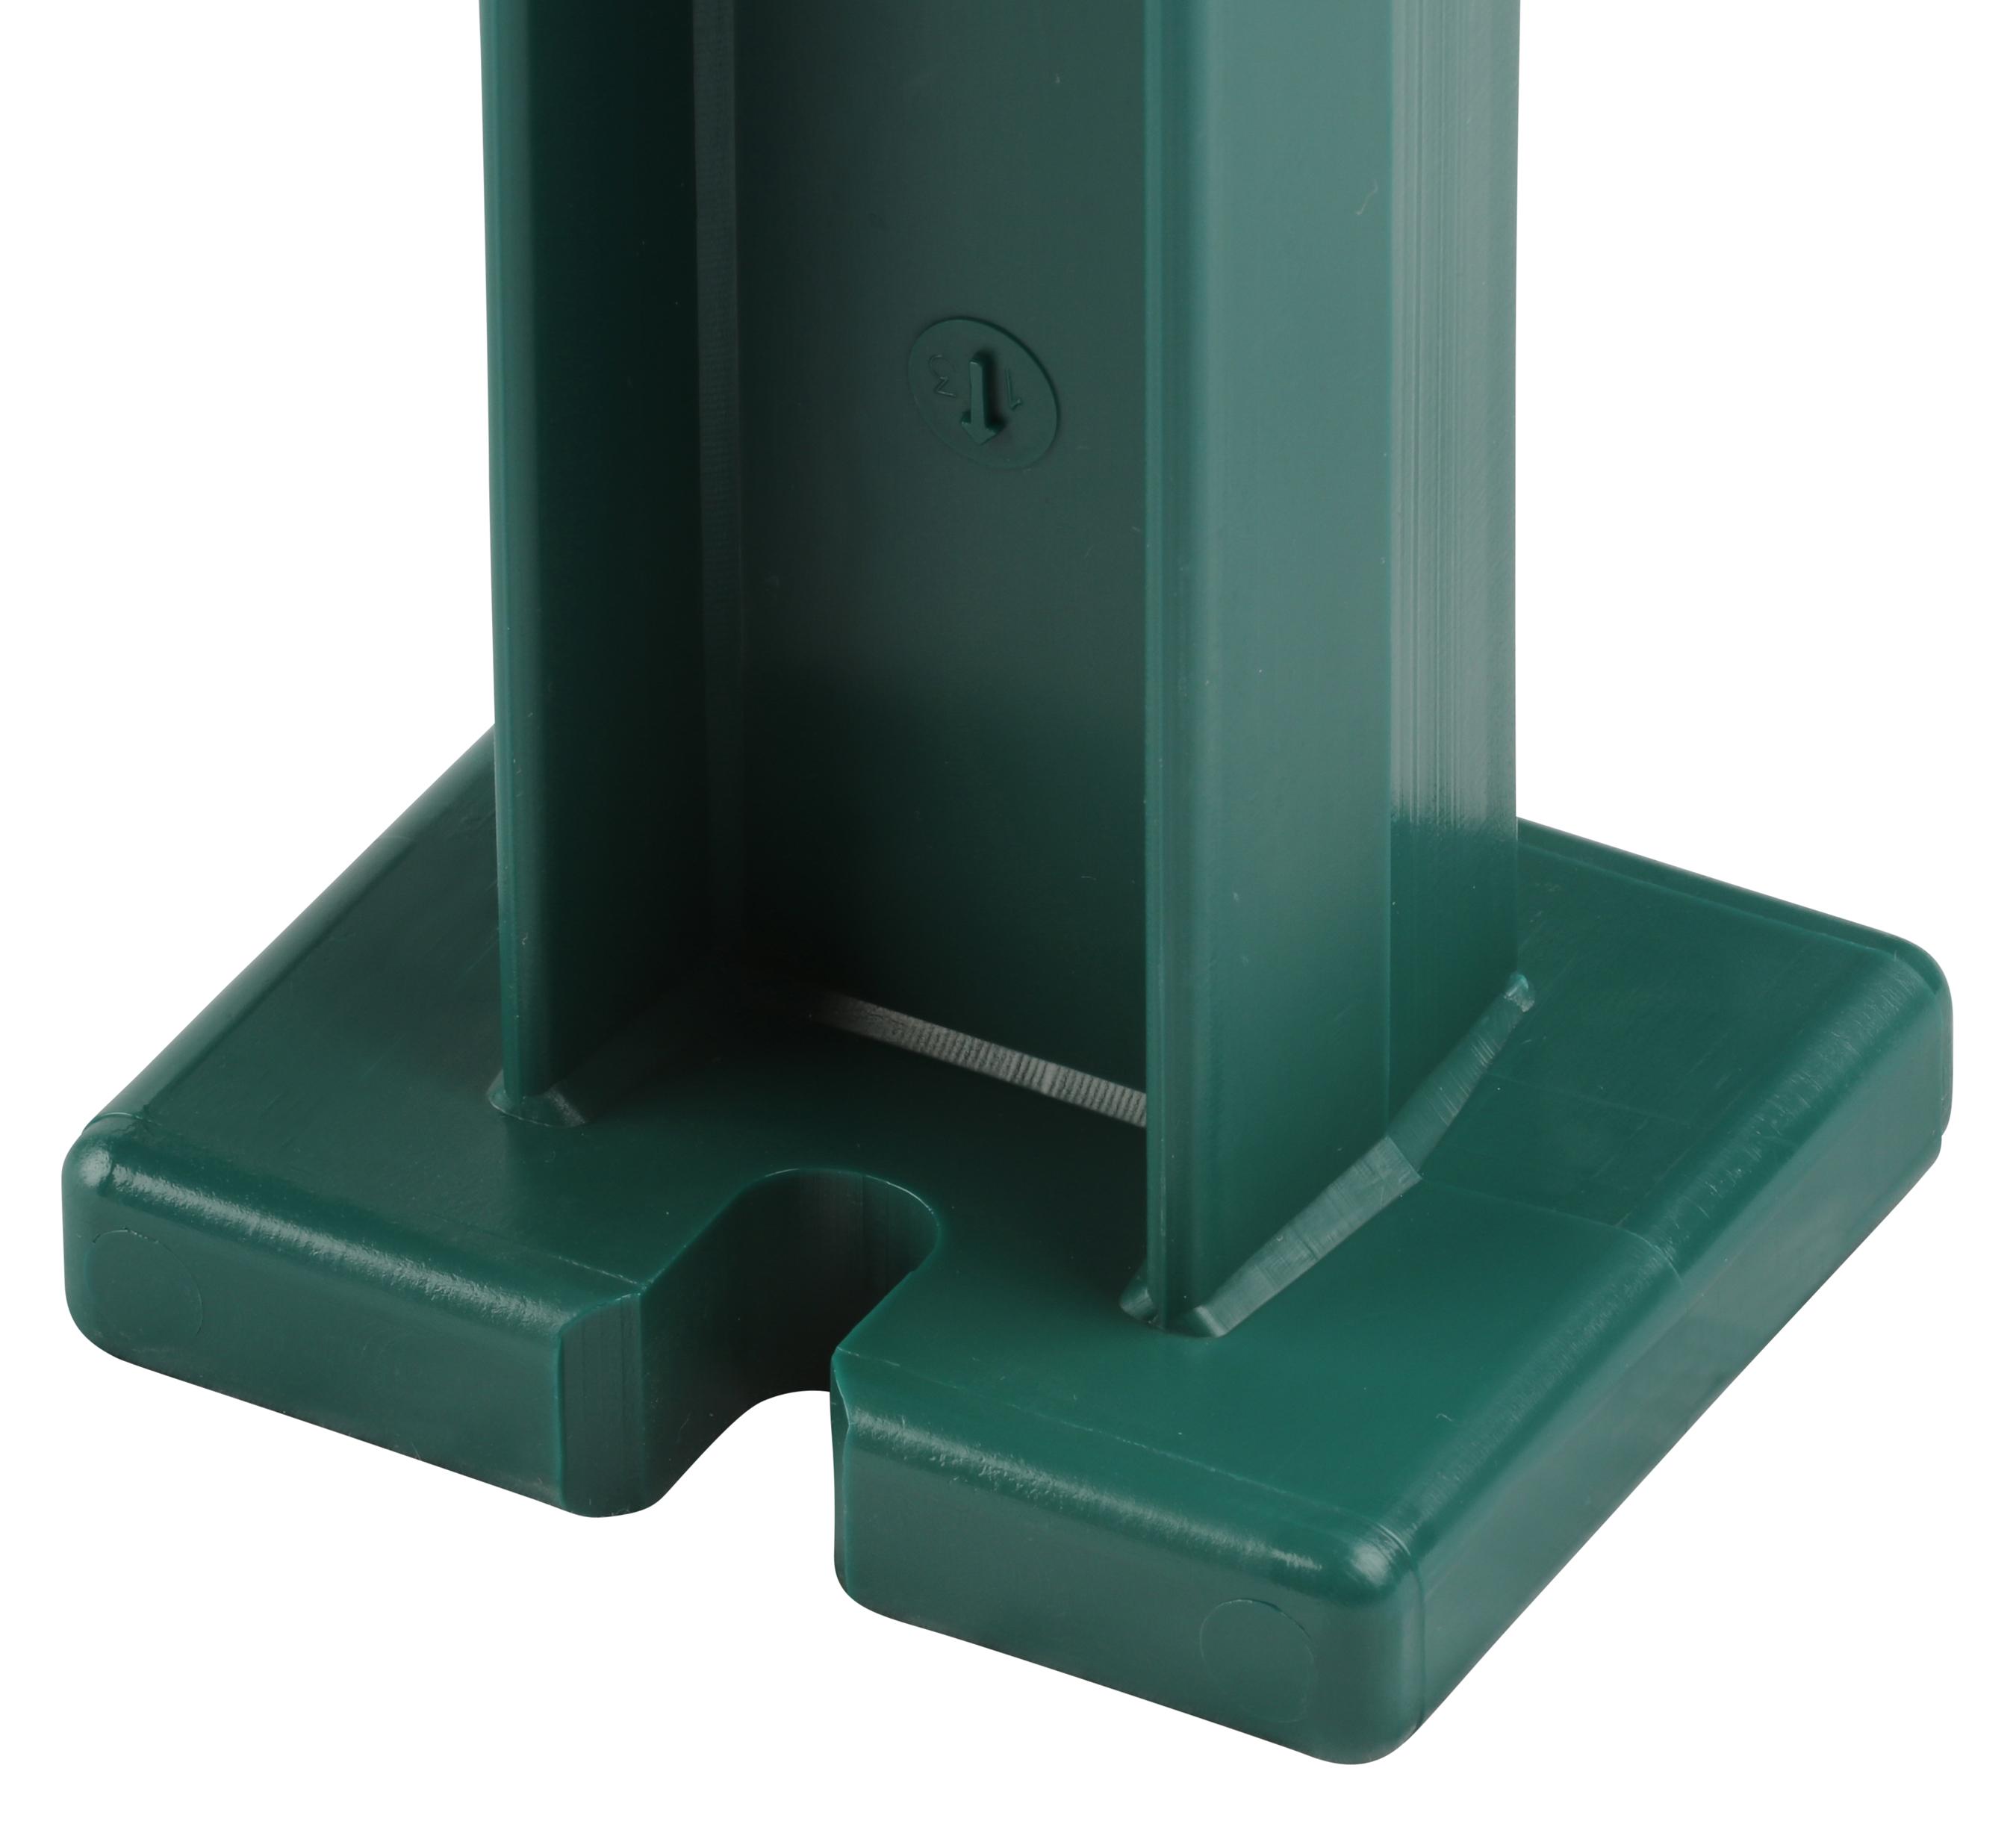 Blome Gartenbank / 3-Sitzer Bank Mono I Kunststoff grün 150cm Bild 2